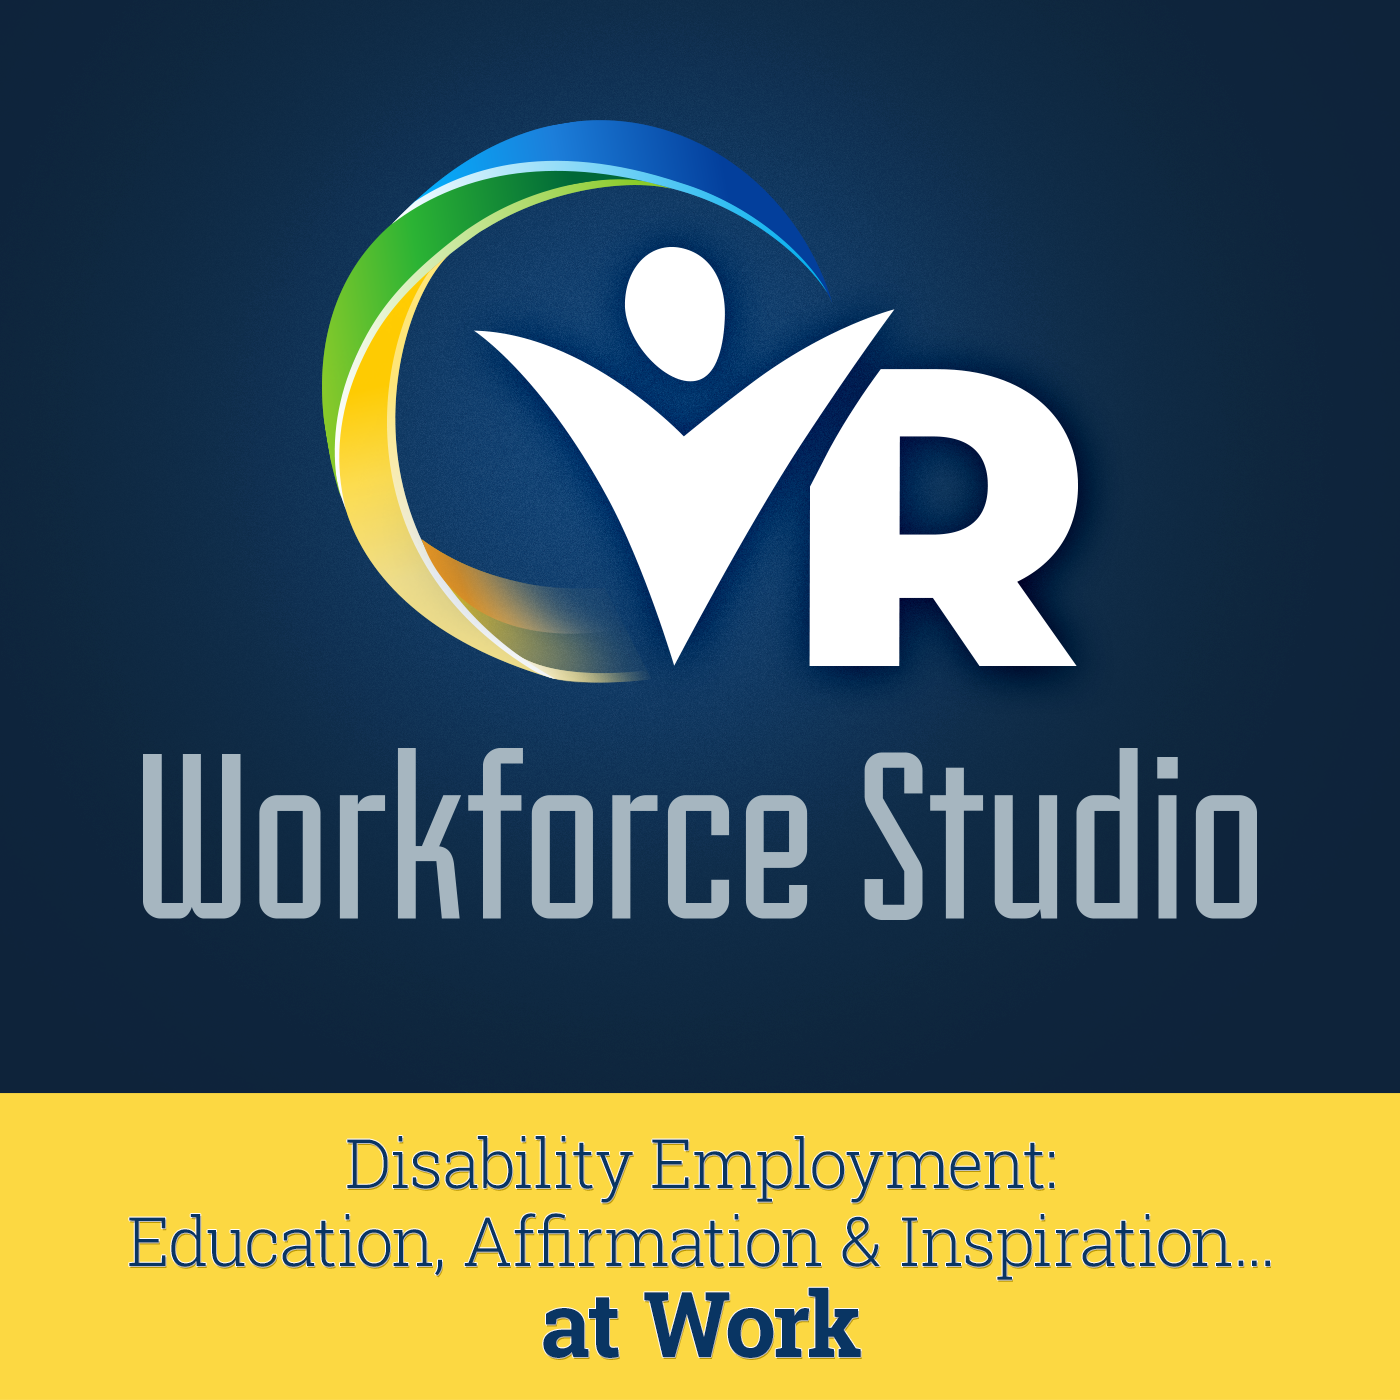 Vr workforce studio listen via stitcher radio on demand 1betcityfo Choice Image